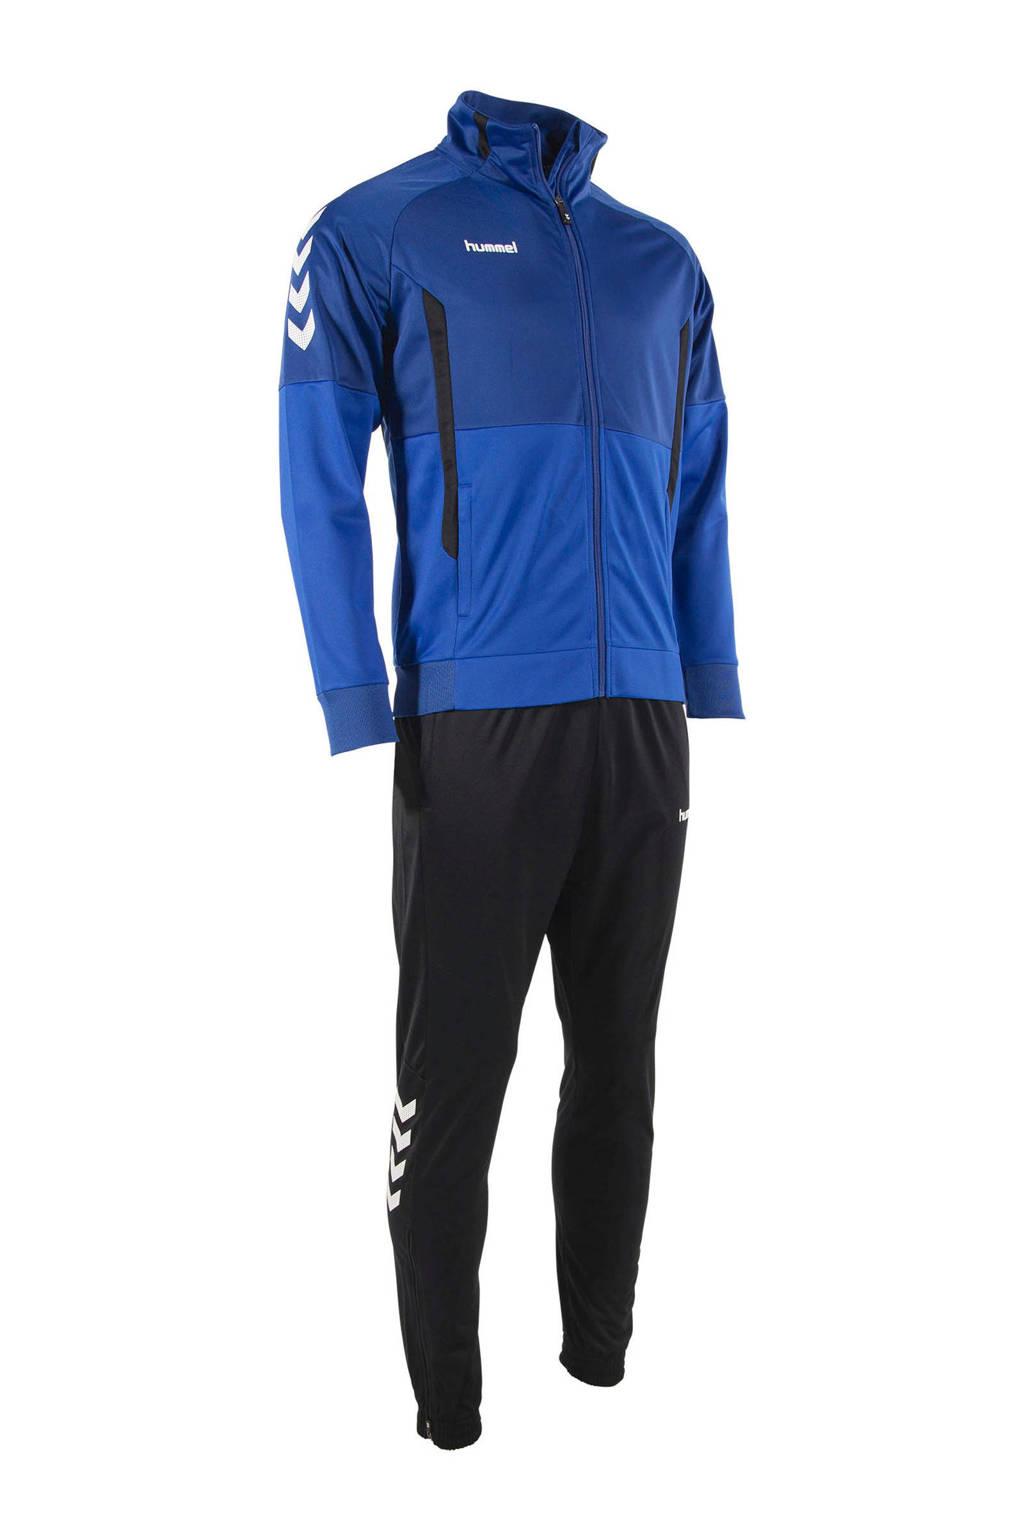 hummel Senior  trainingspak blauw/zwart, Blauw/zwart